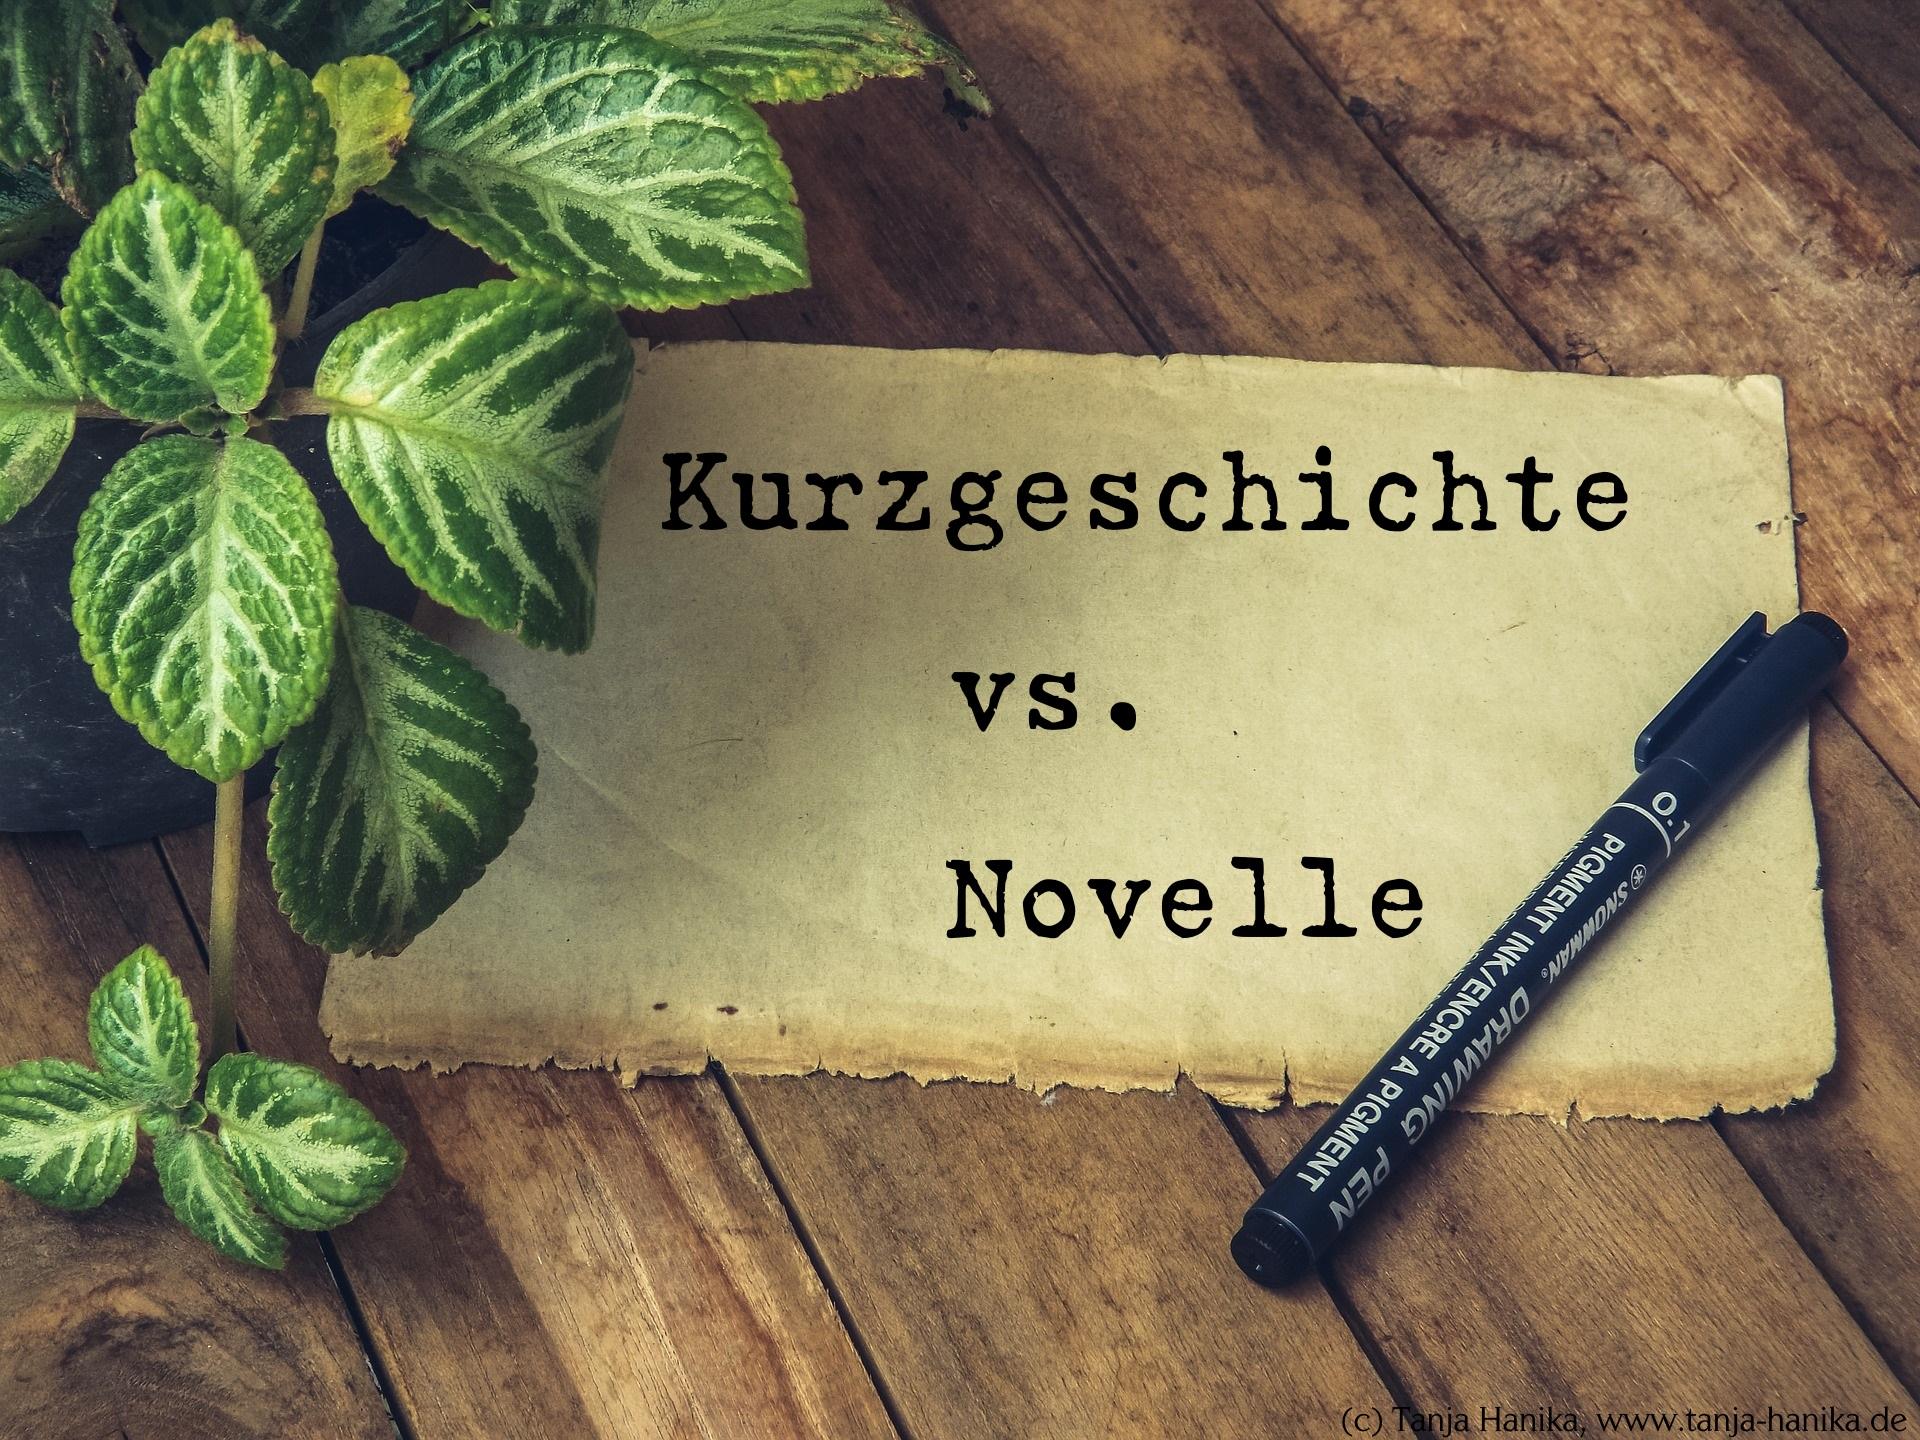 Kurzgeschichte vs. Novelle